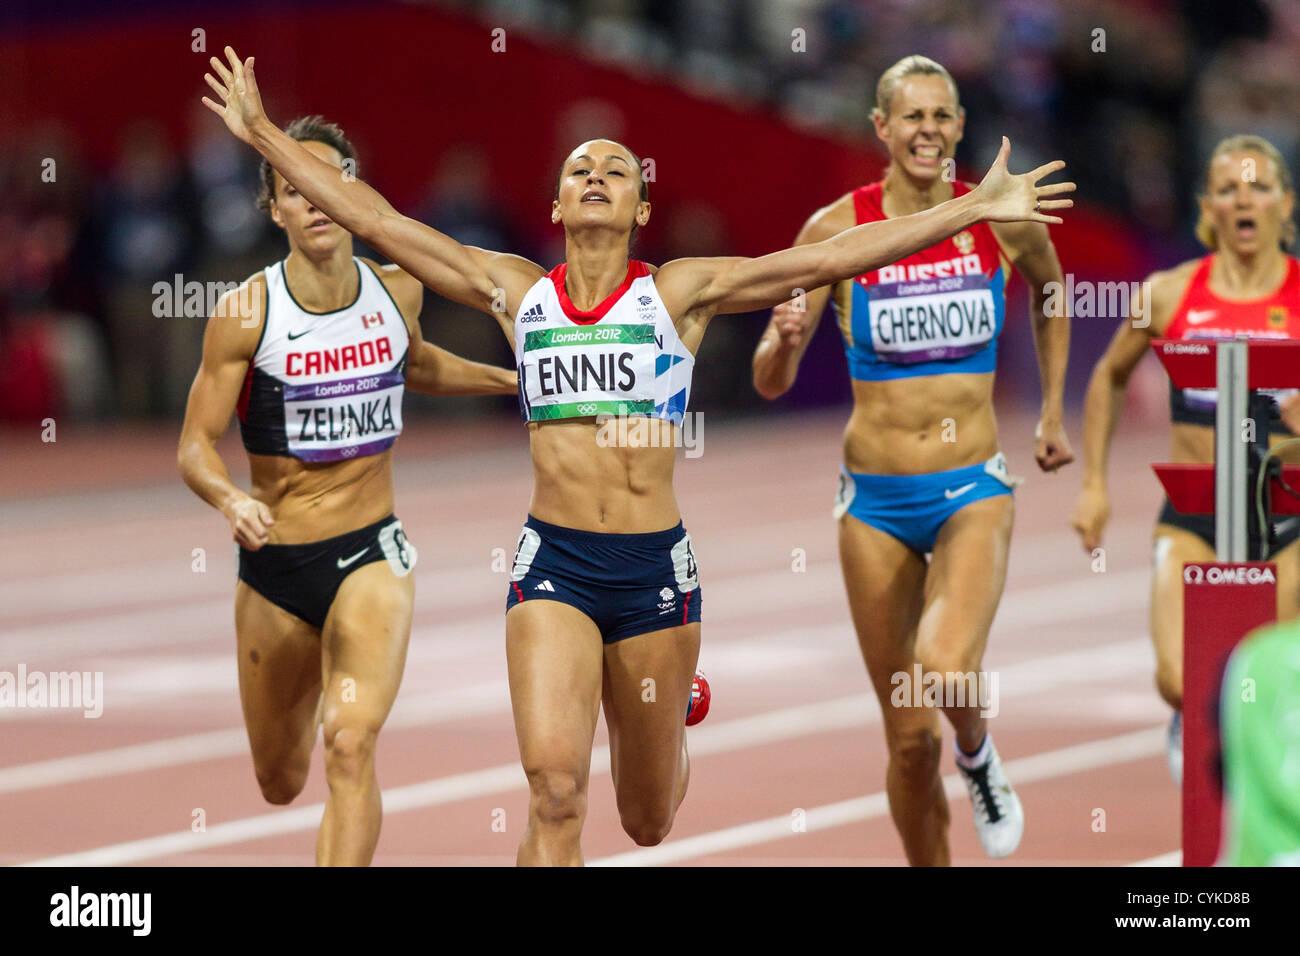 London 2012 Olympics Stock Photos & London 2012 Olympics